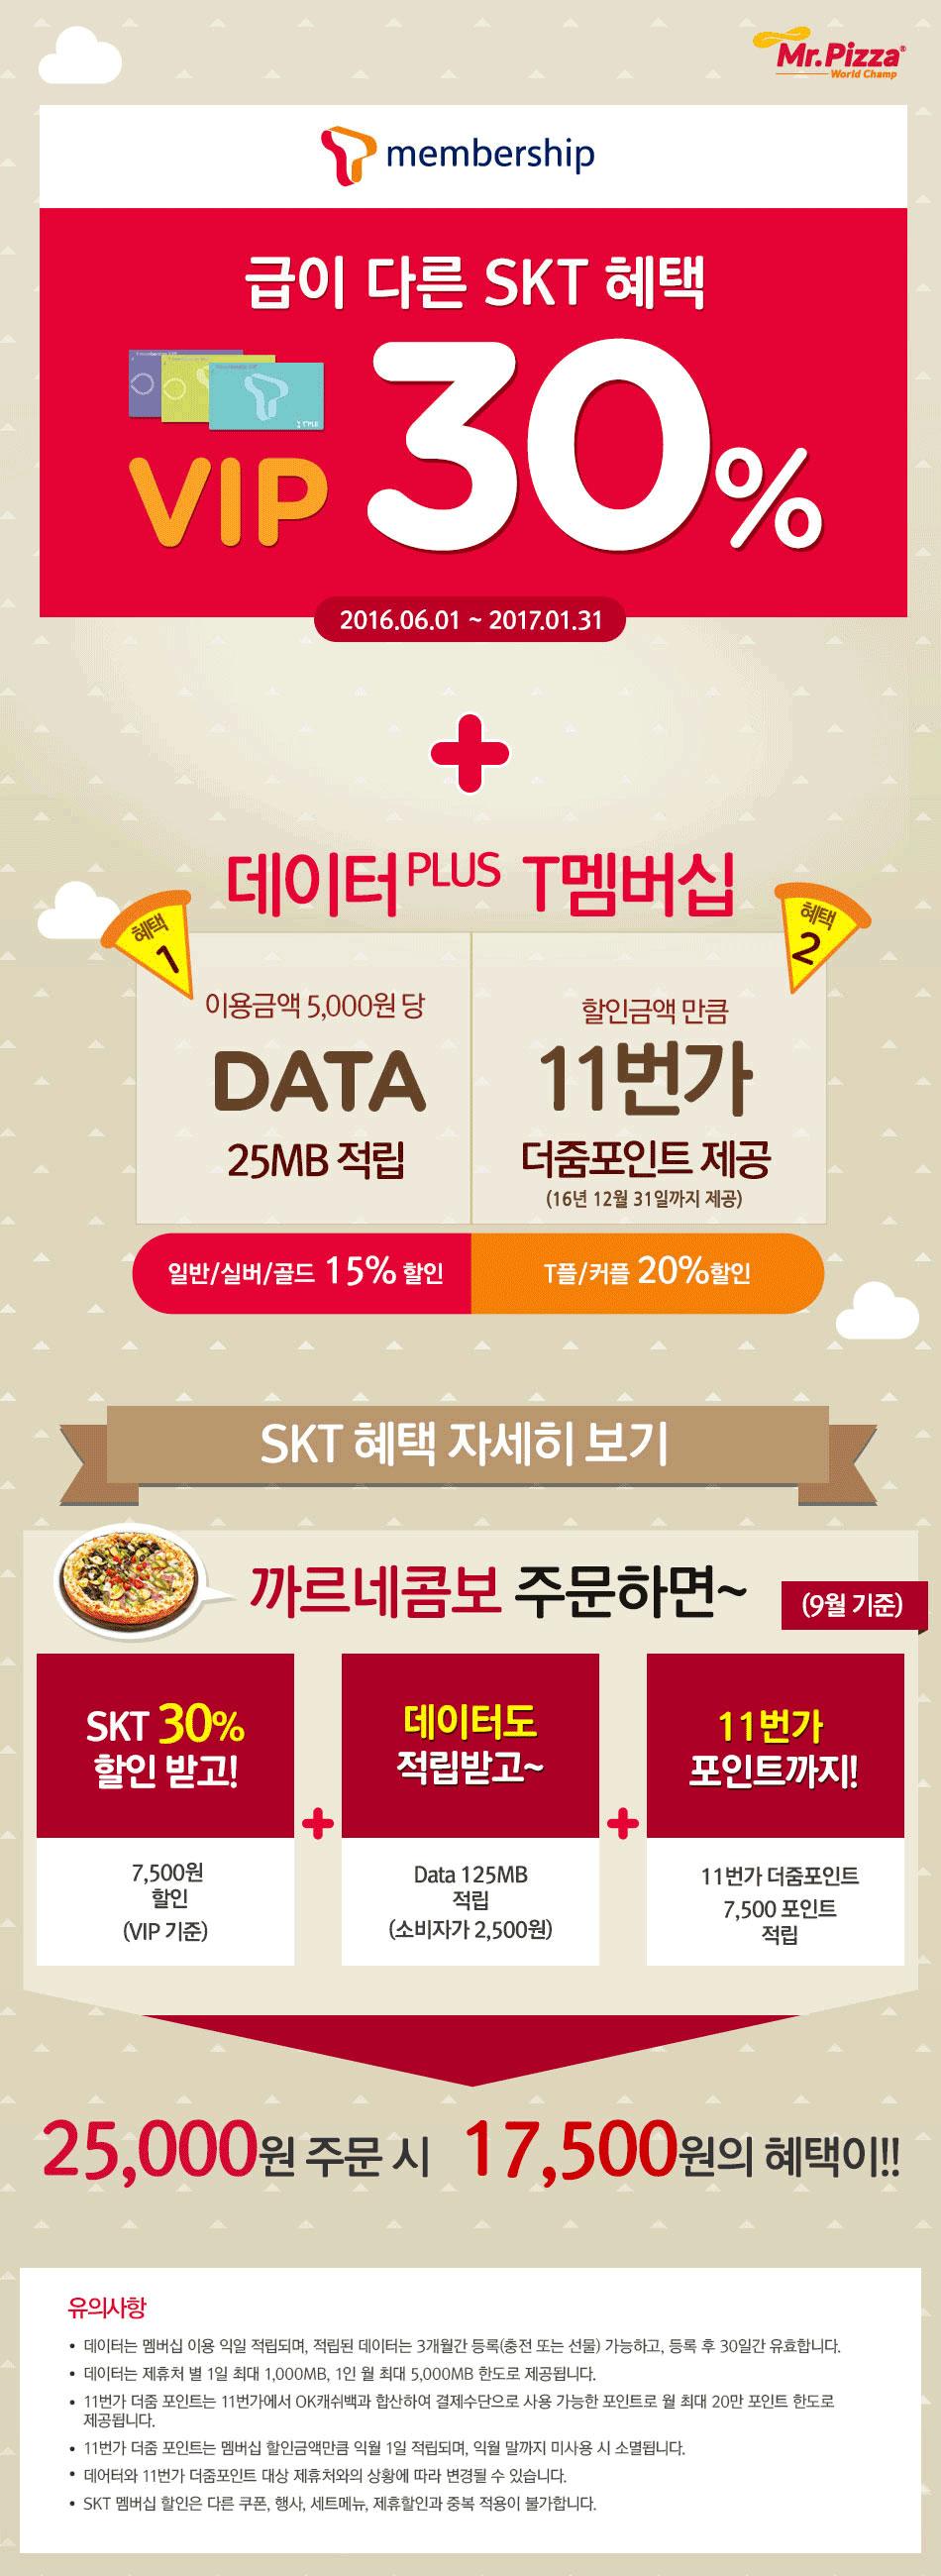 SKT VIP 30% 할인 + 데이터플러스 혜택까지!